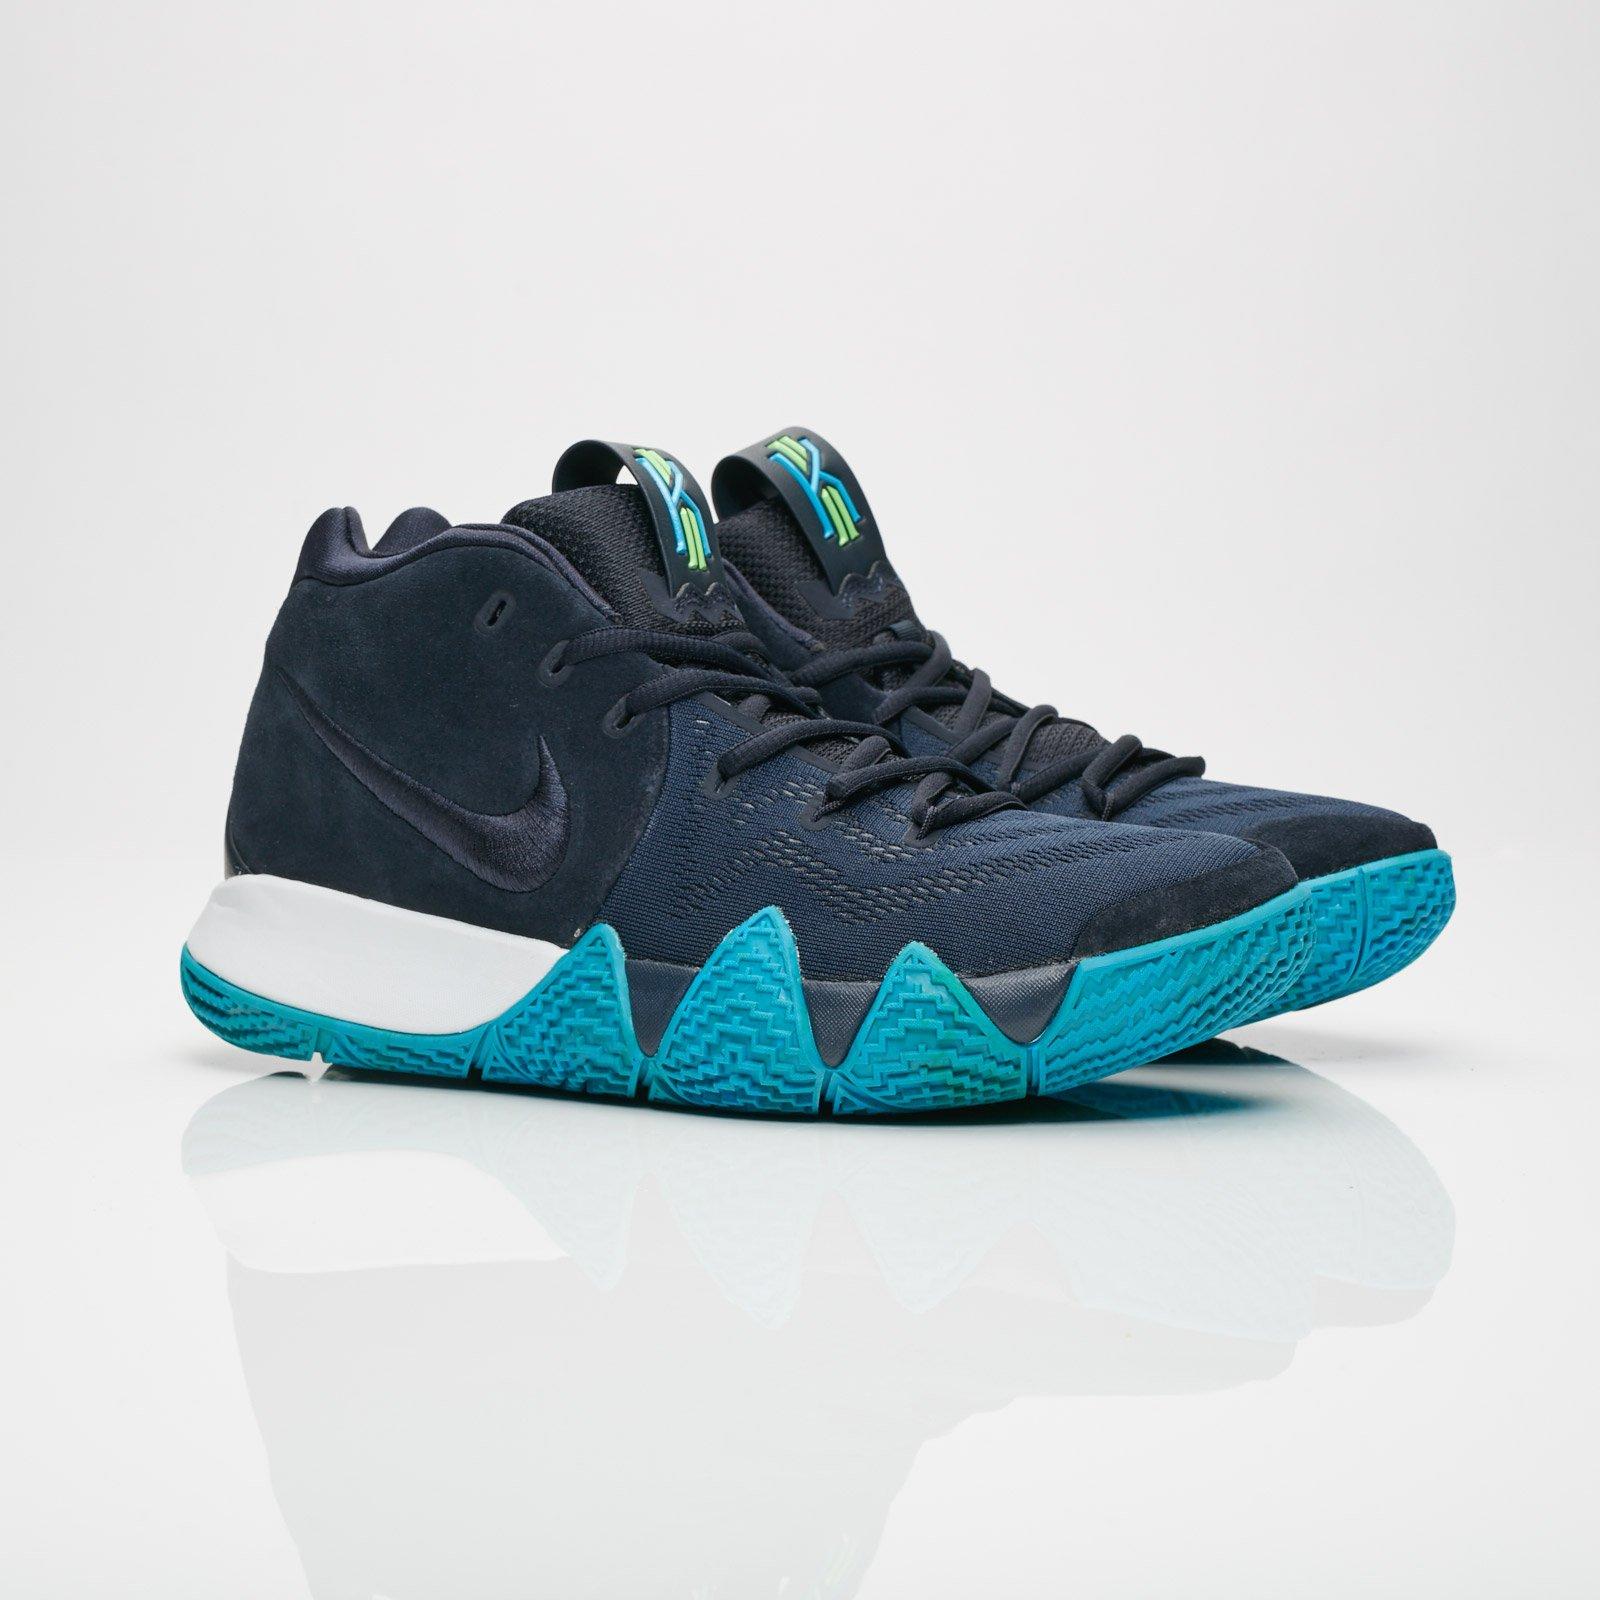 a67ed69c00d4 Nike Kyrie 4 - 943806-401 - Sneakersnstuff